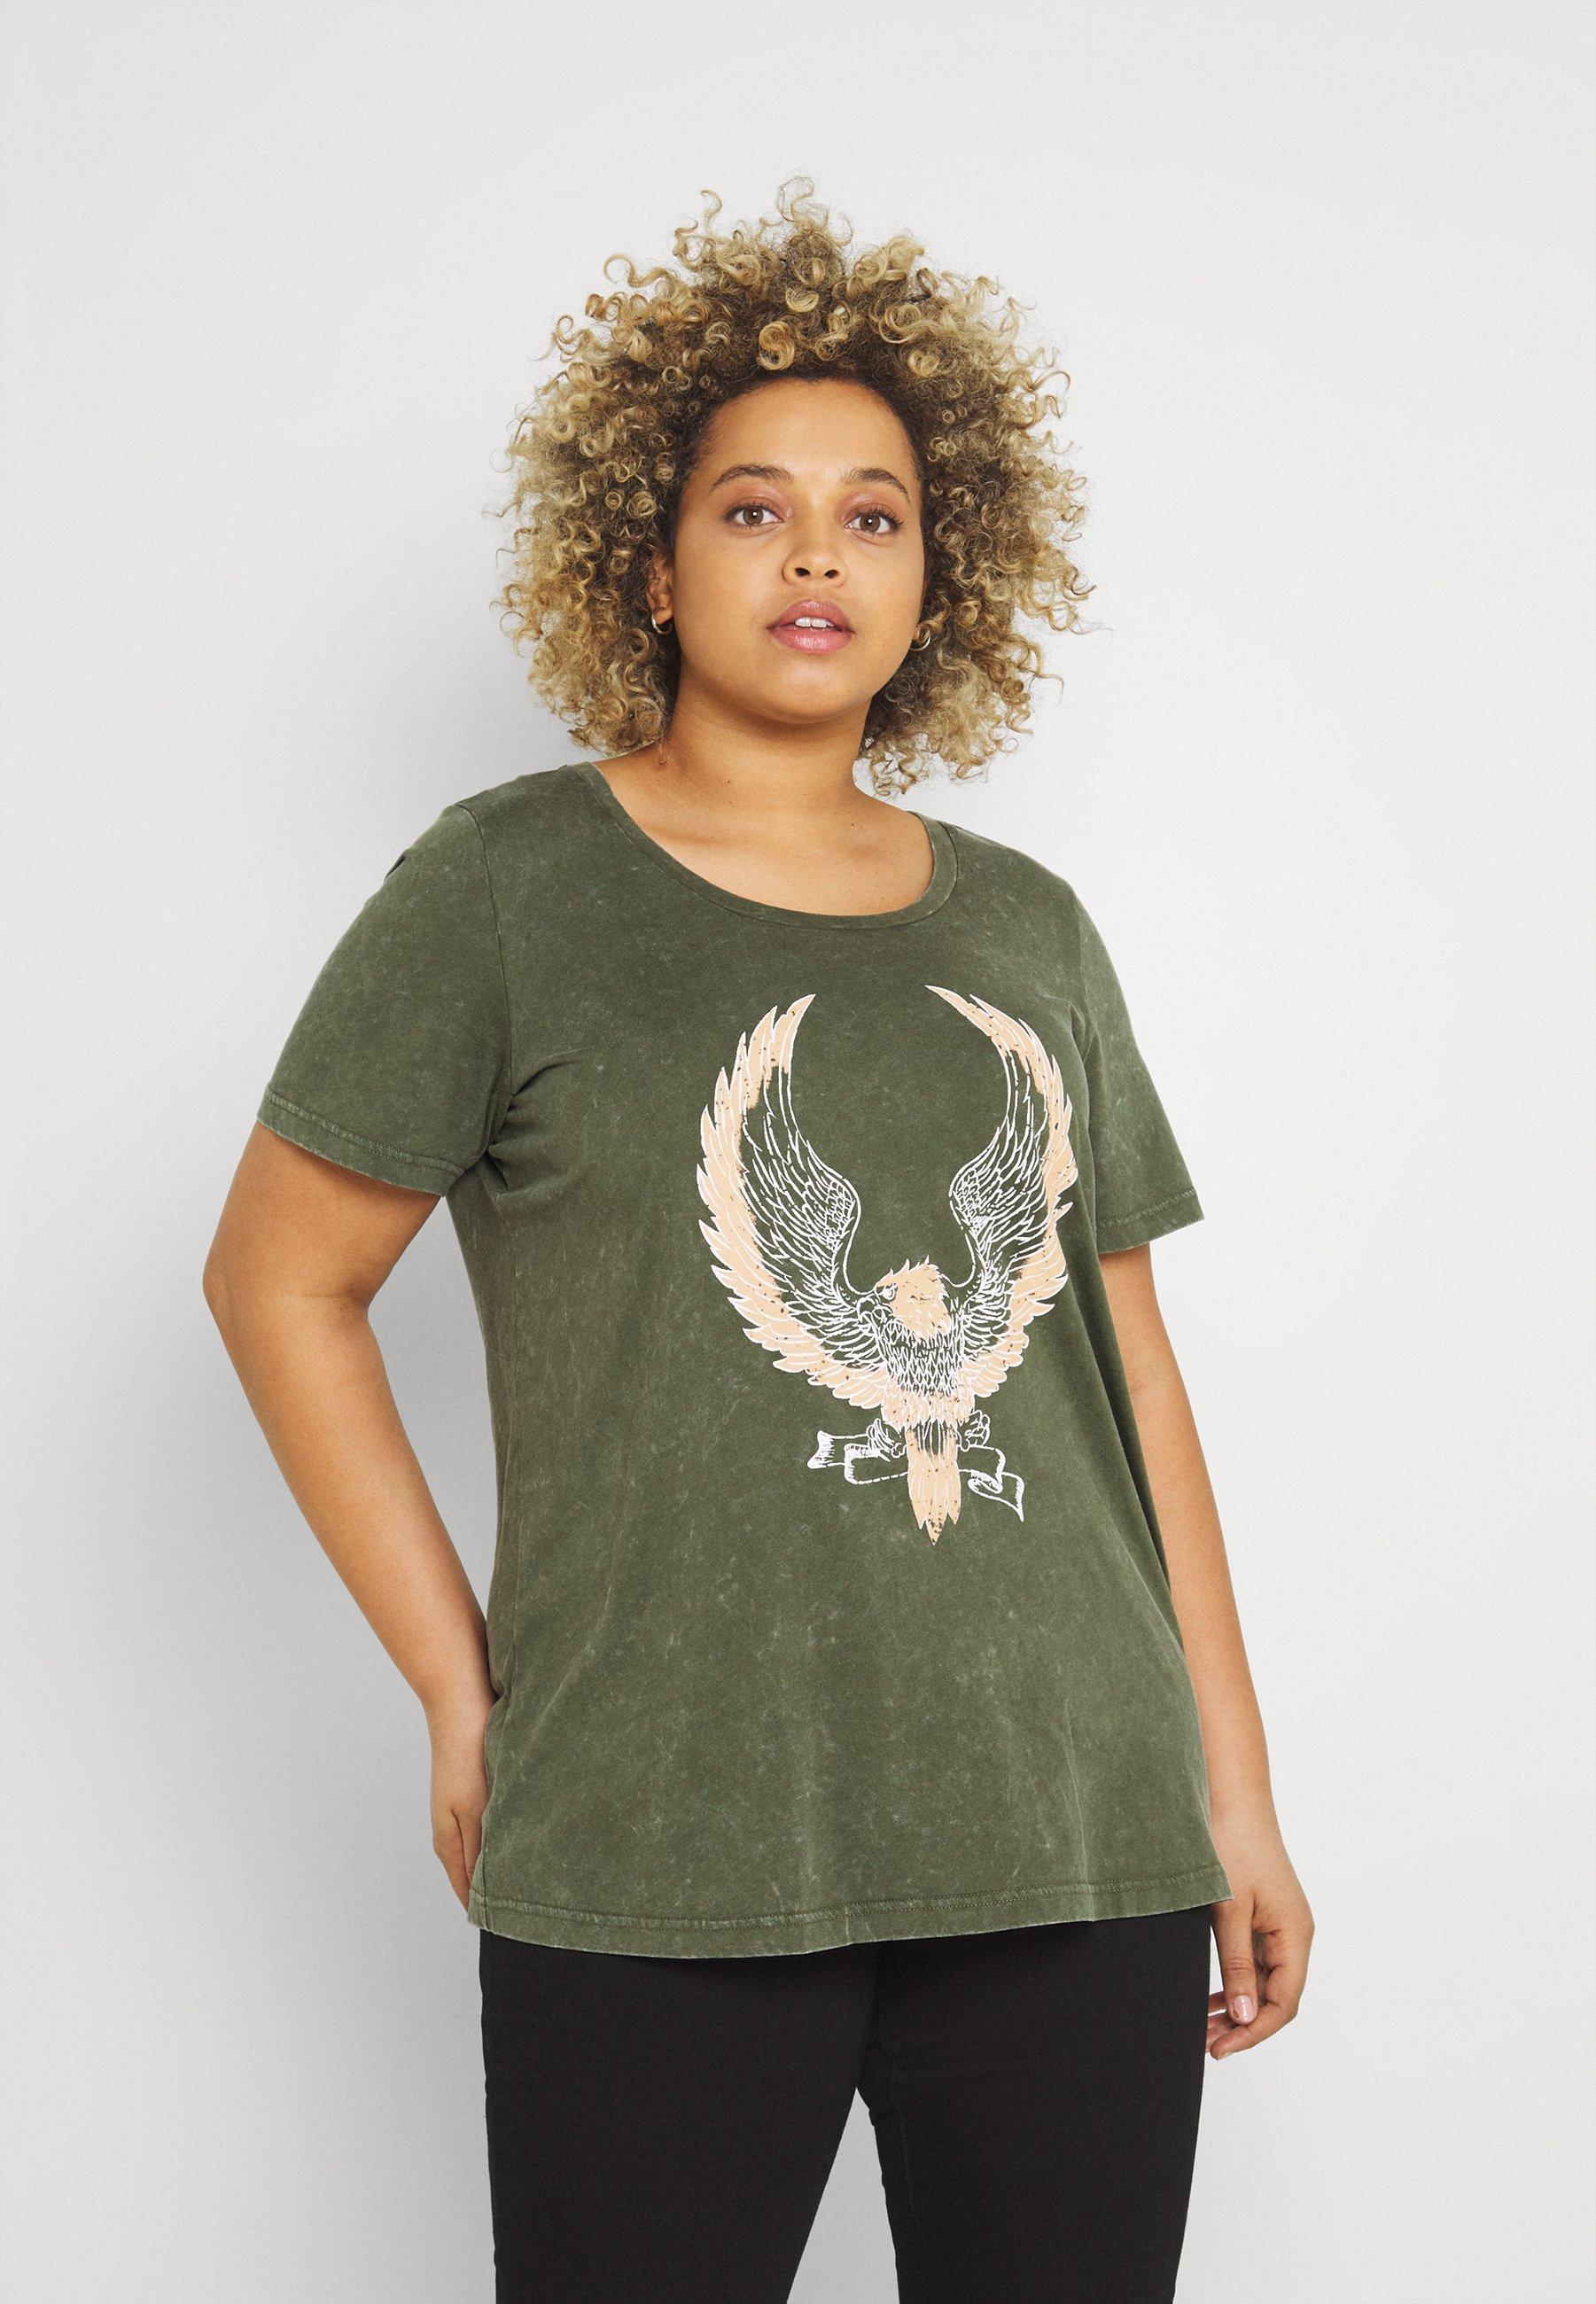 Women MBRIANA - Print T-shirt - ivy green